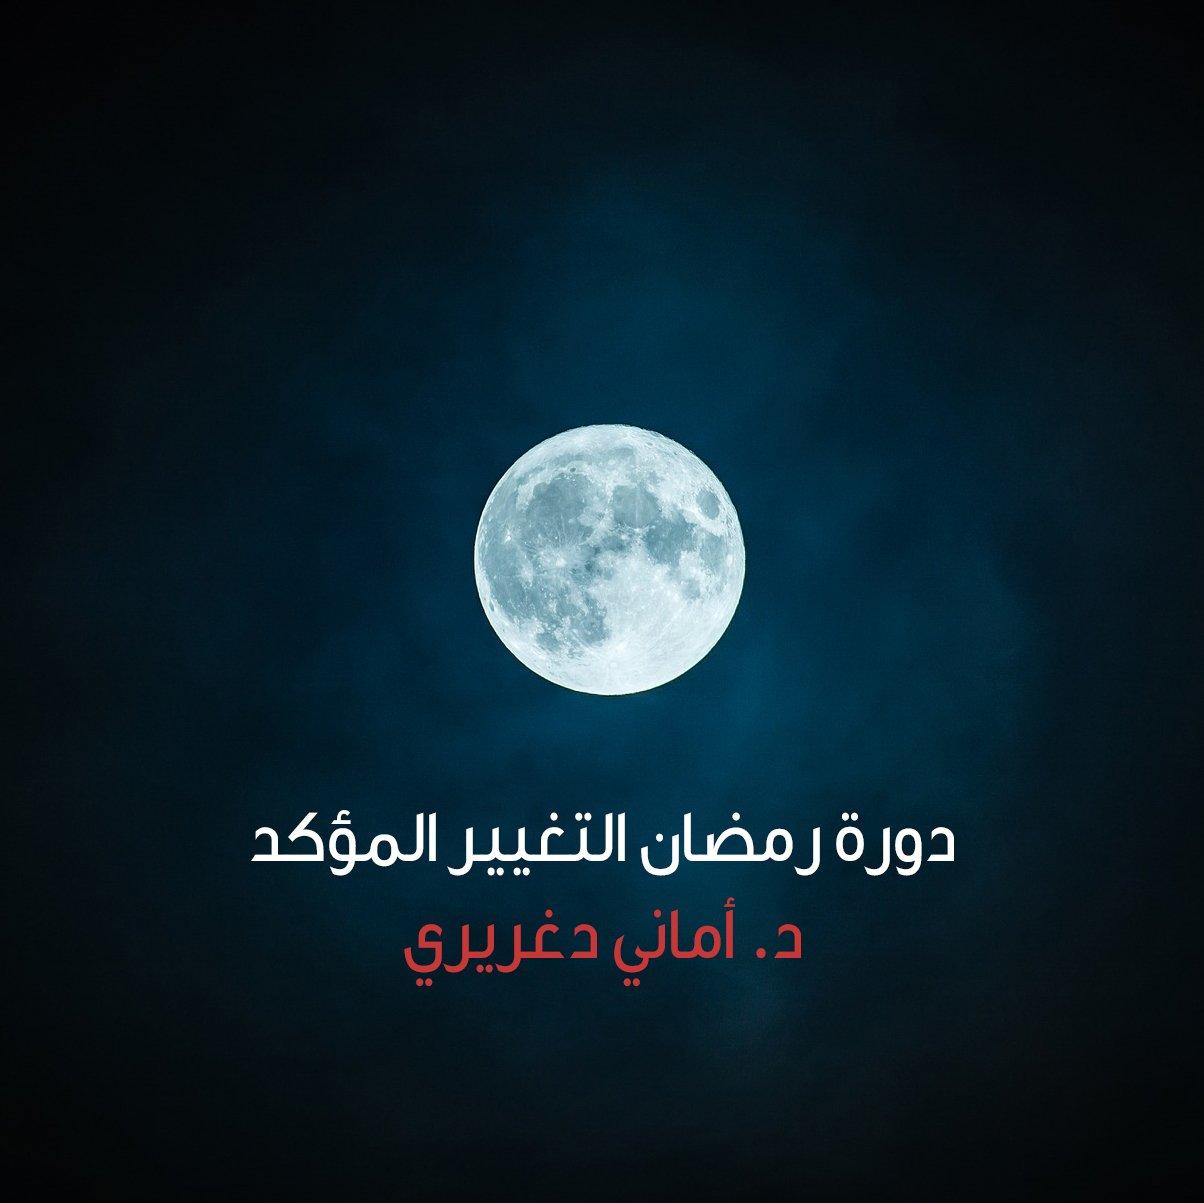 moon-1859616_1920 copy